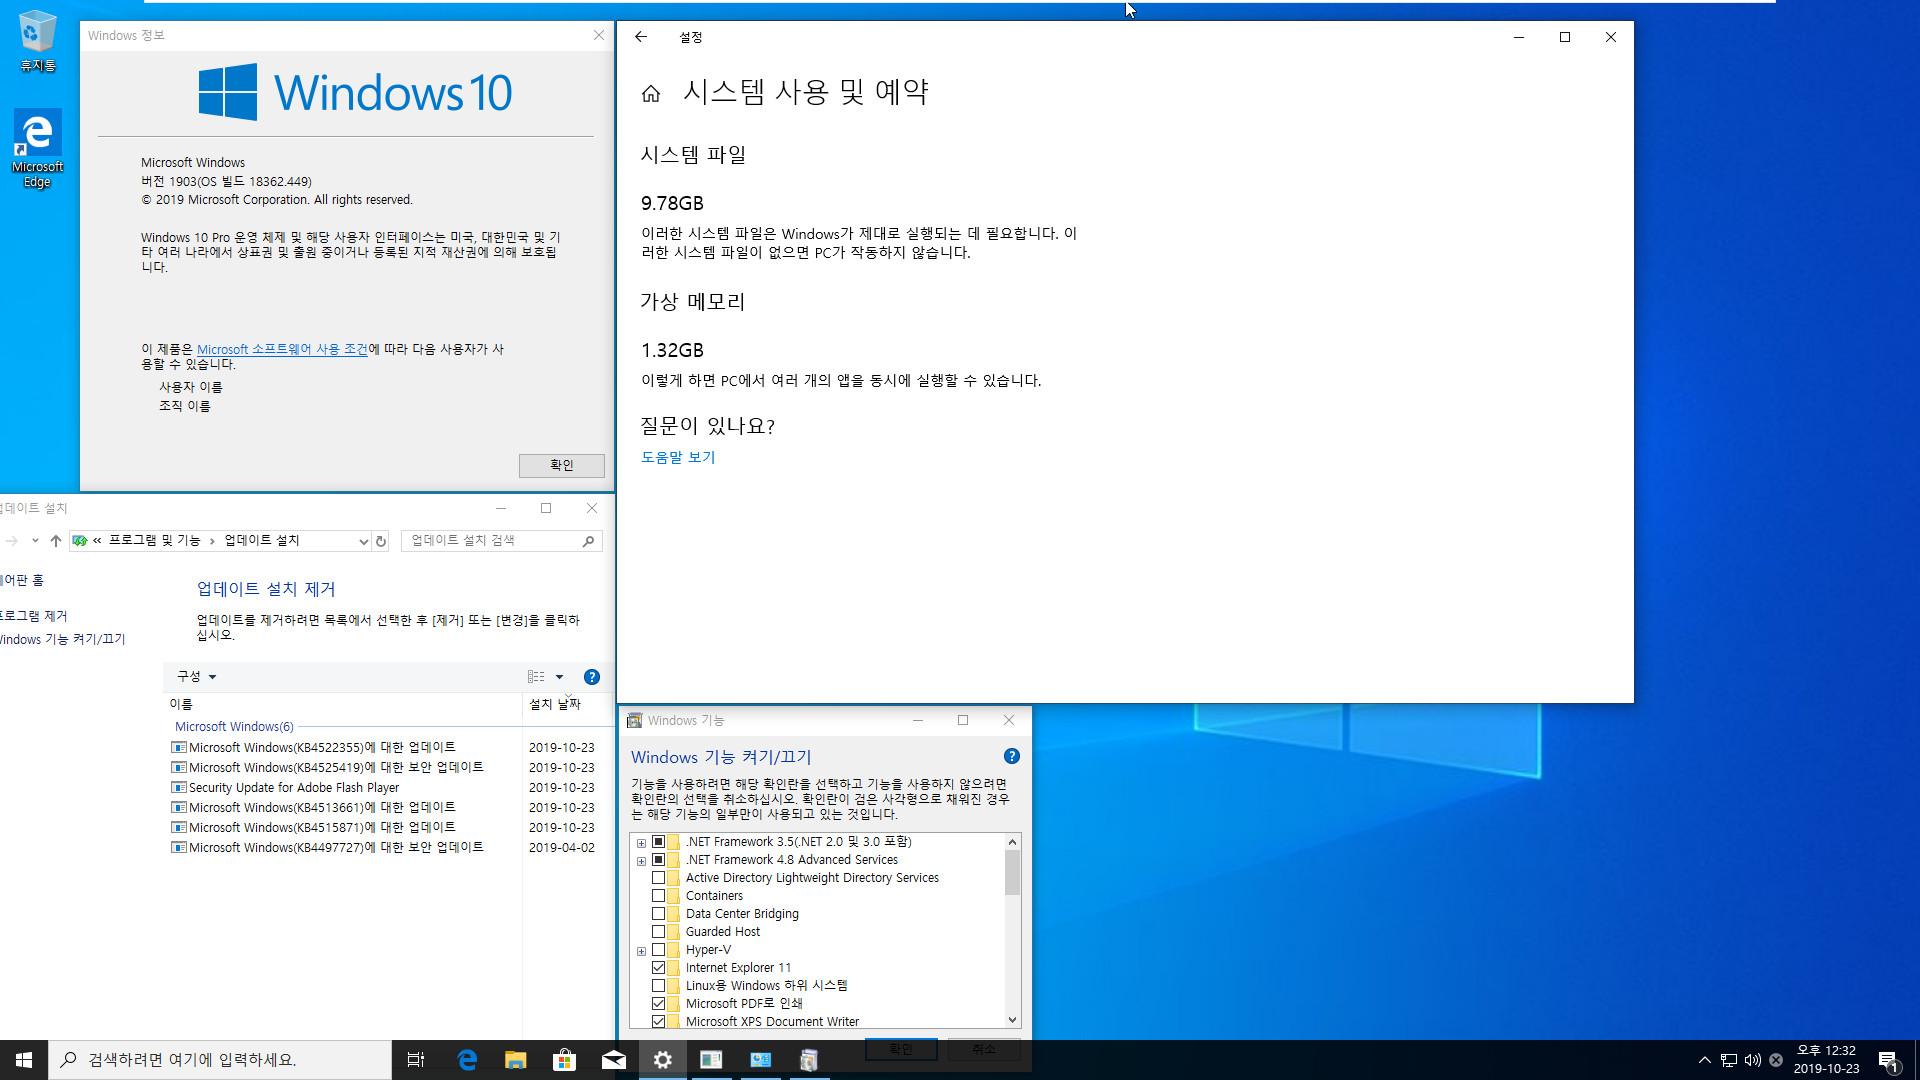 Windows 10 버전 1909 누적 업데이트 KB4522355 (OS 빌드 18363.449) [2019-10-22 일자] [릴리스 프리뷰] 나왔네요 - 19H2와 19H1을 함께 프로 64비트 install.wim 통합합니다. [최초기록, 예약된 저장소 삭제 적용] 2019-10-23_123203.jpg